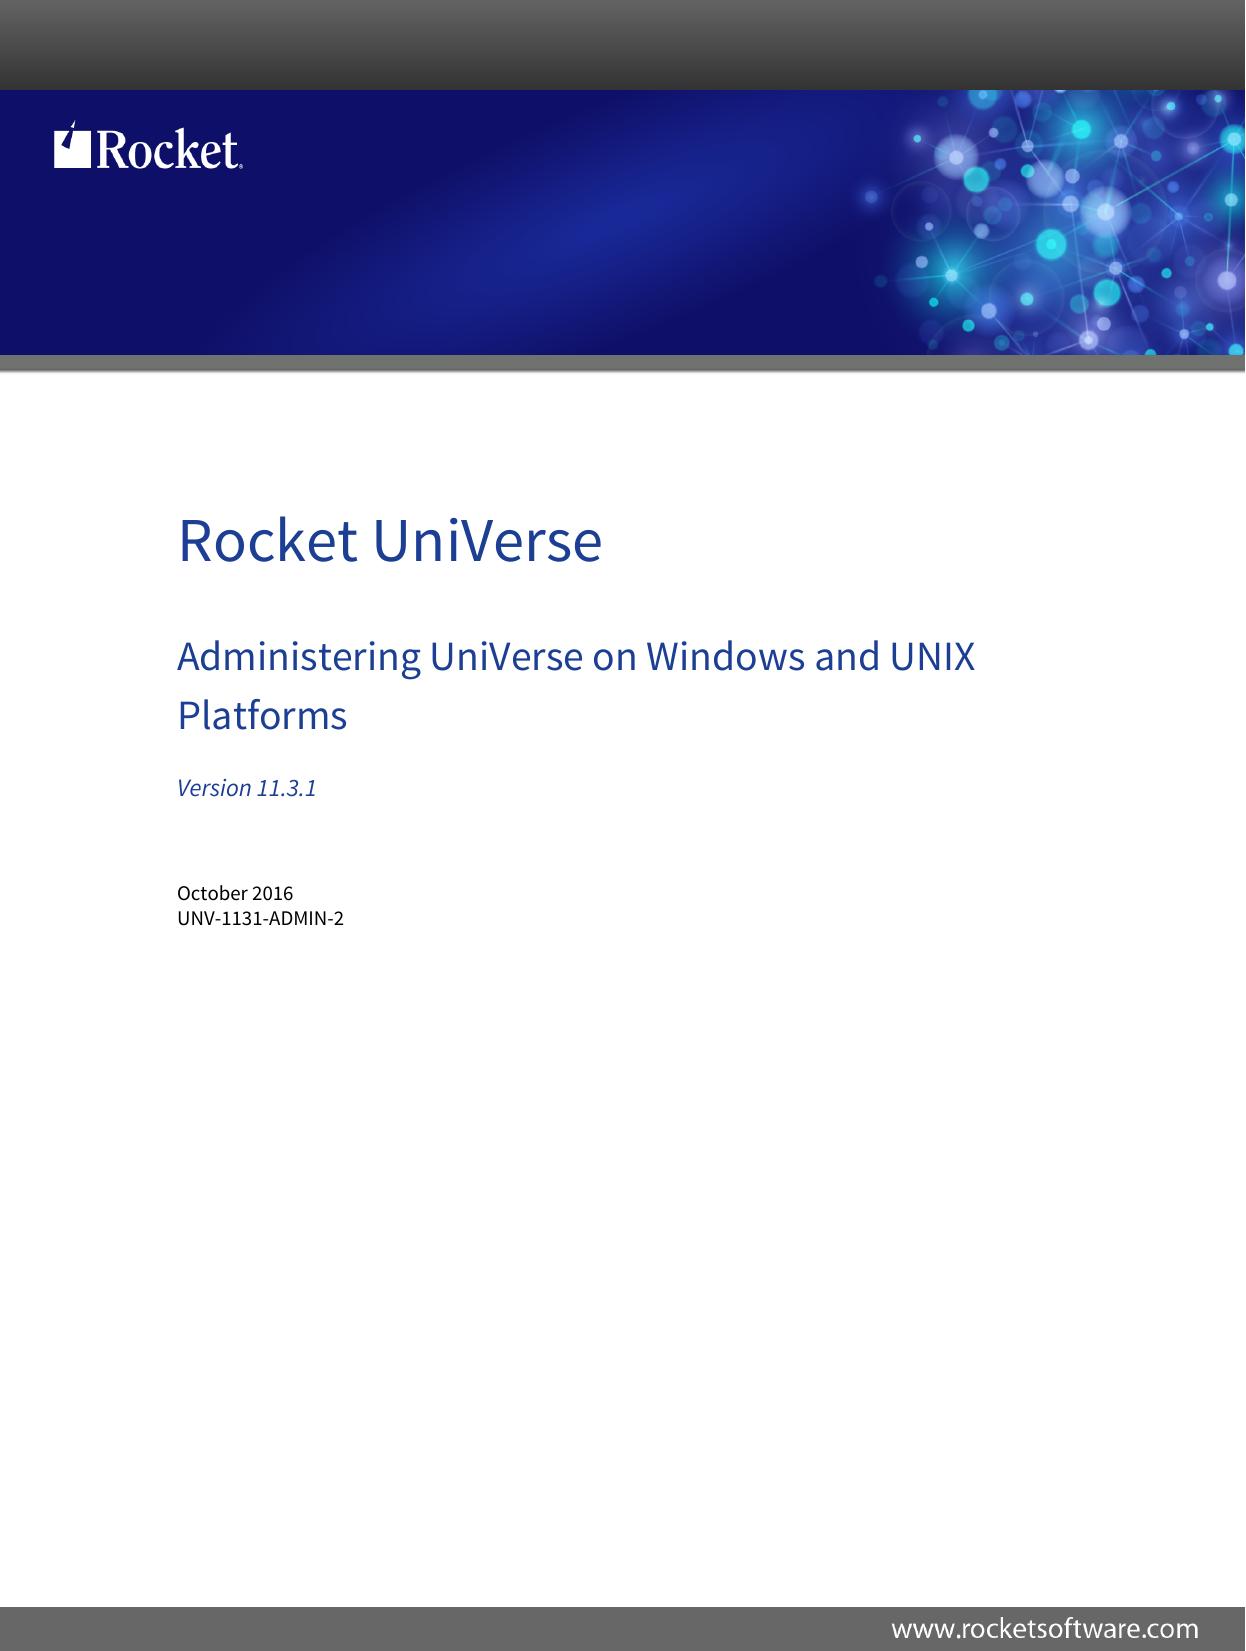 Rocket Administering UniVerse on Windows and UNIX Platforms